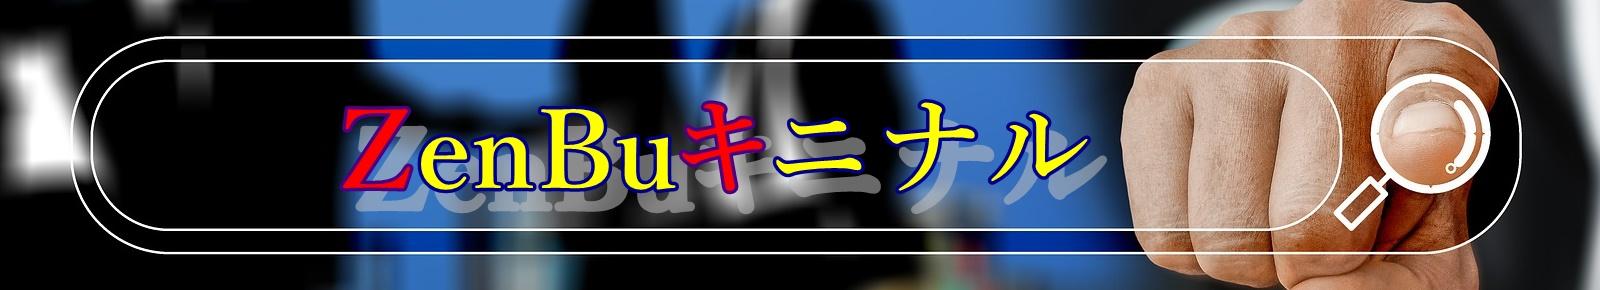 ZenBuキニナル